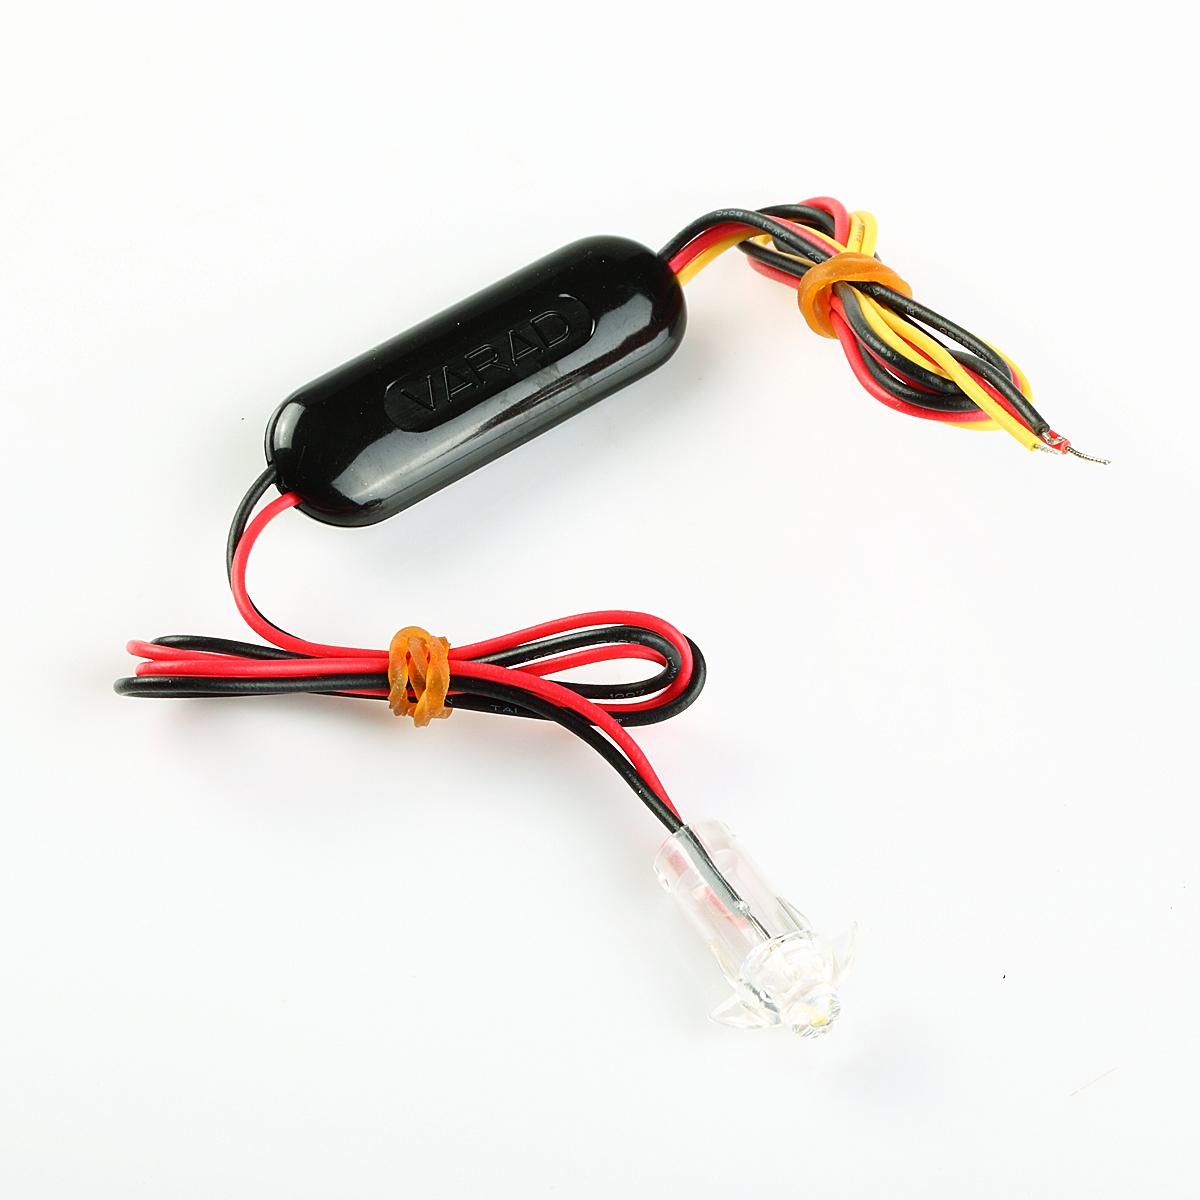 varad led wiring diagram varad image wiring diagram varad ll wh 12v flashing white led hyperbright car alarm indicator on varad led wiring diagram